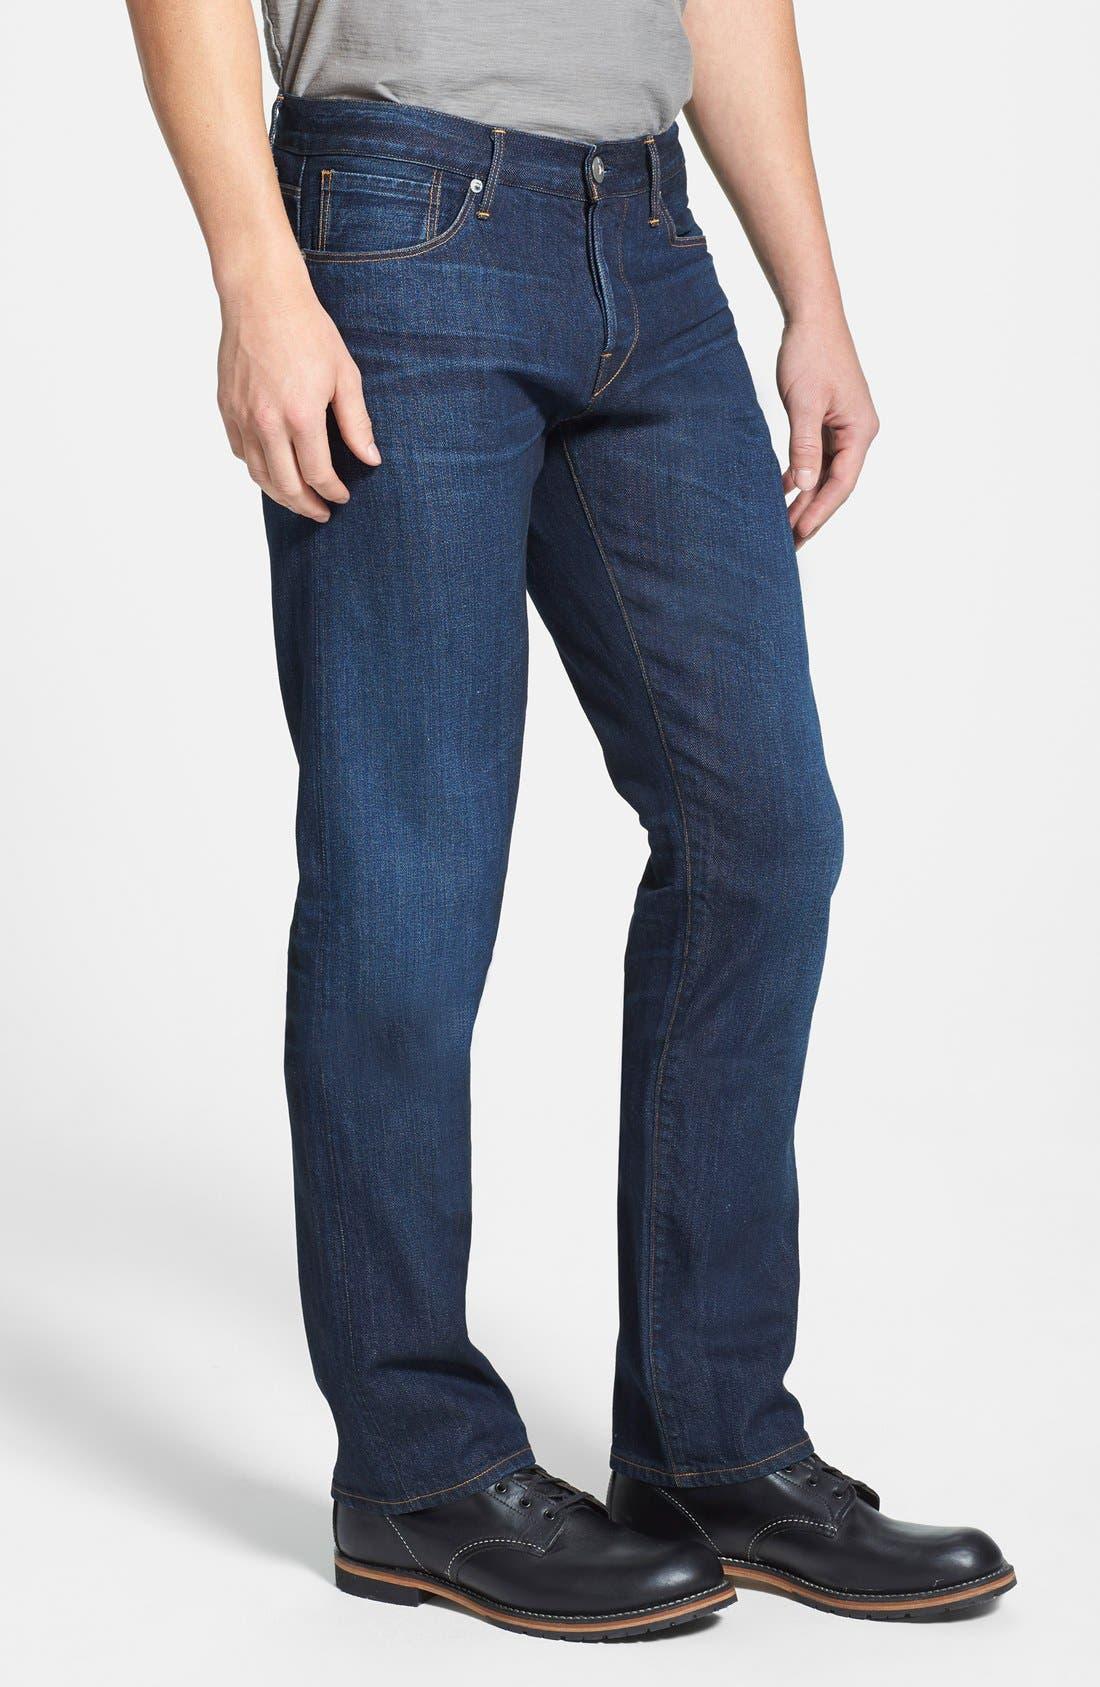 'M4' Straight Leg Selvedge Jeans,                             Alternate thumbnail 3, color,                             Makers